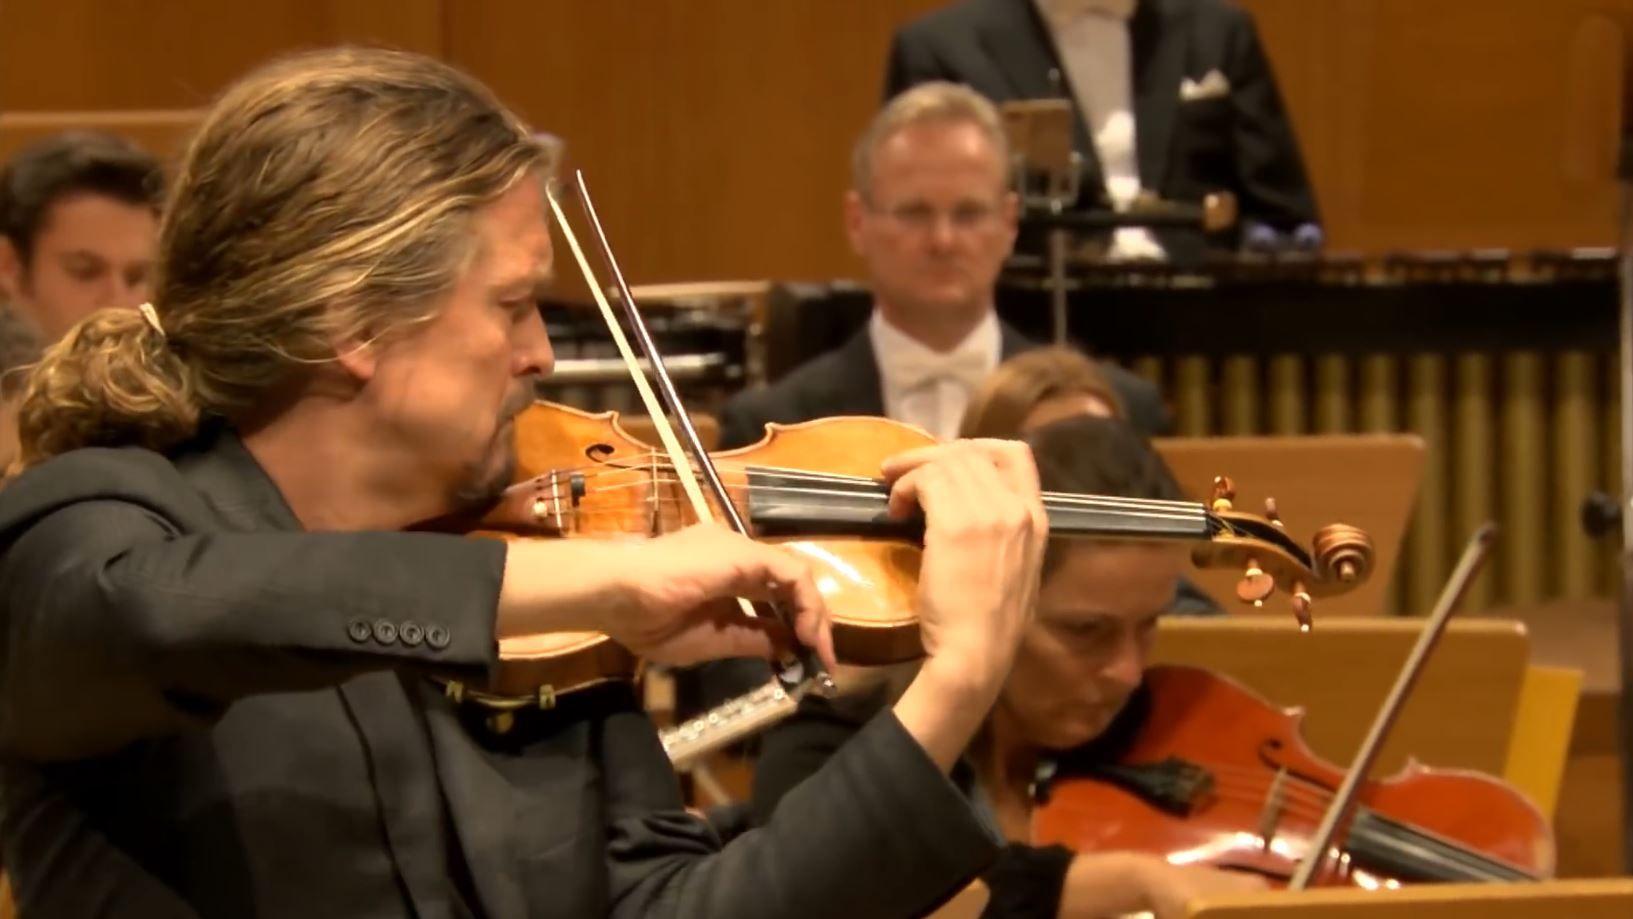 Gyorgy Ligeti Violin Concerto Christian Tetzlaff Gurzenich Orchester Koln Francois Xavier Roth Classical Music Concert Violin